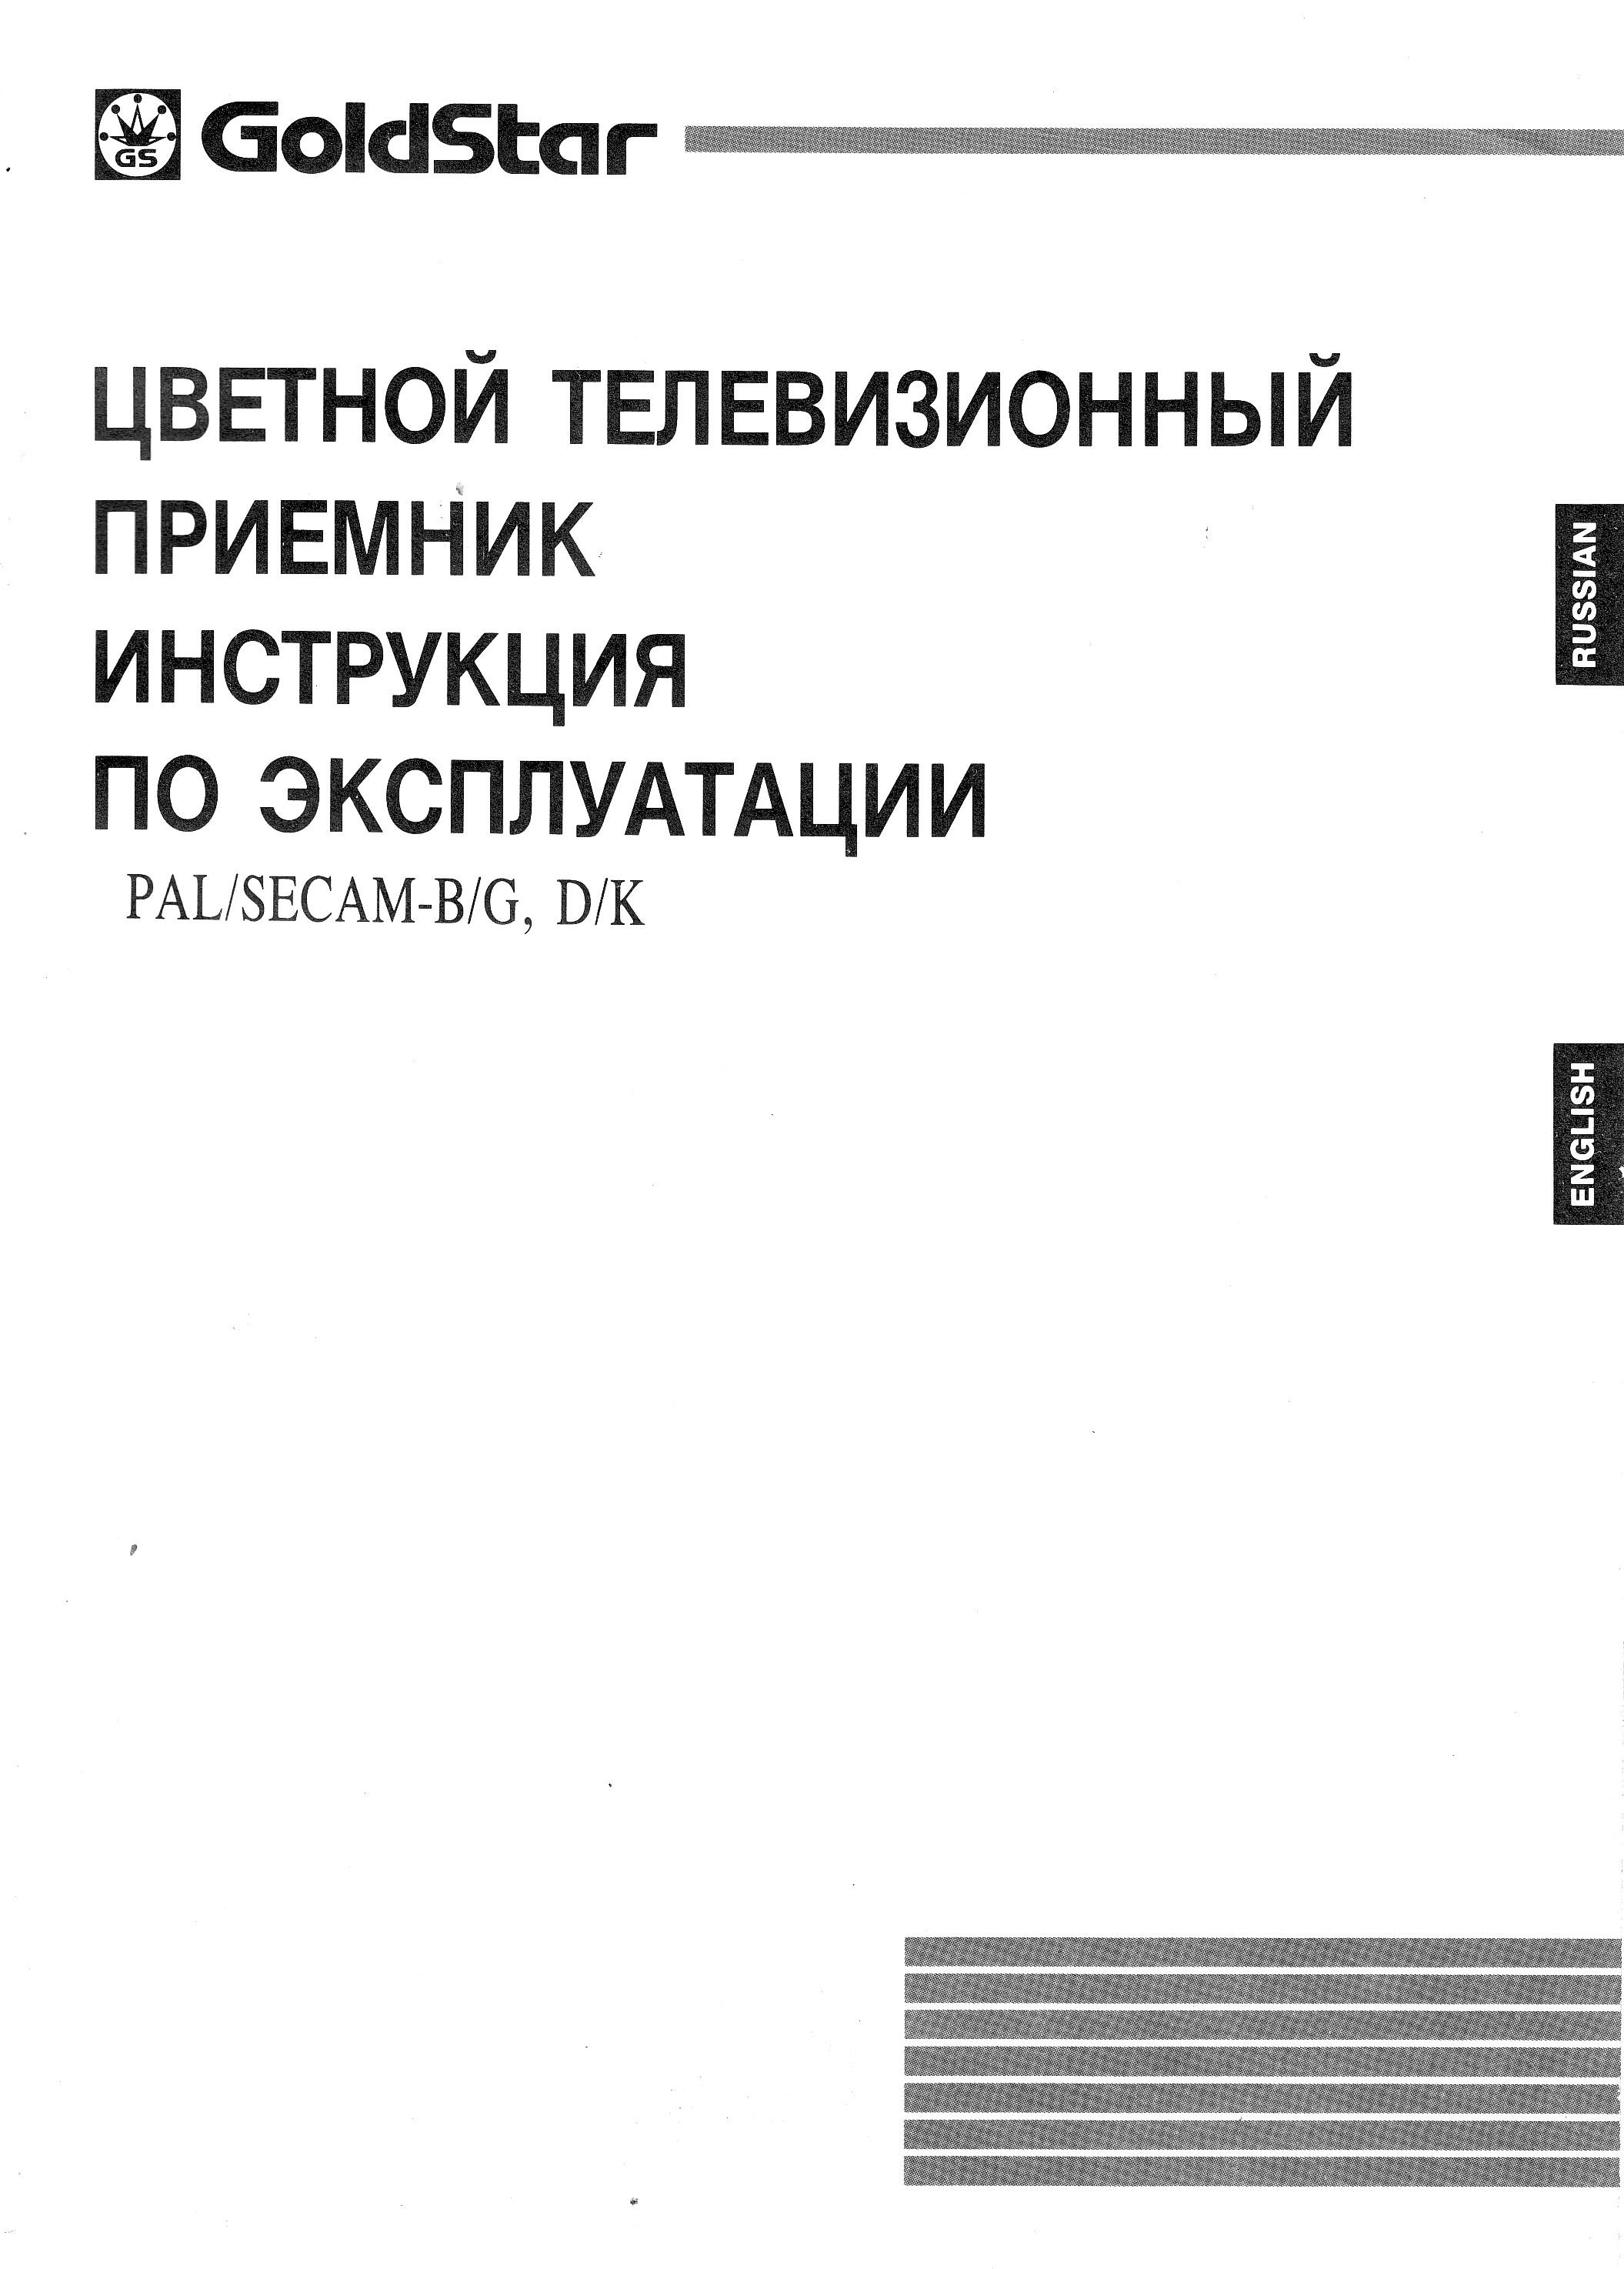 Инструкция по эксплуатации телевизора goldstar